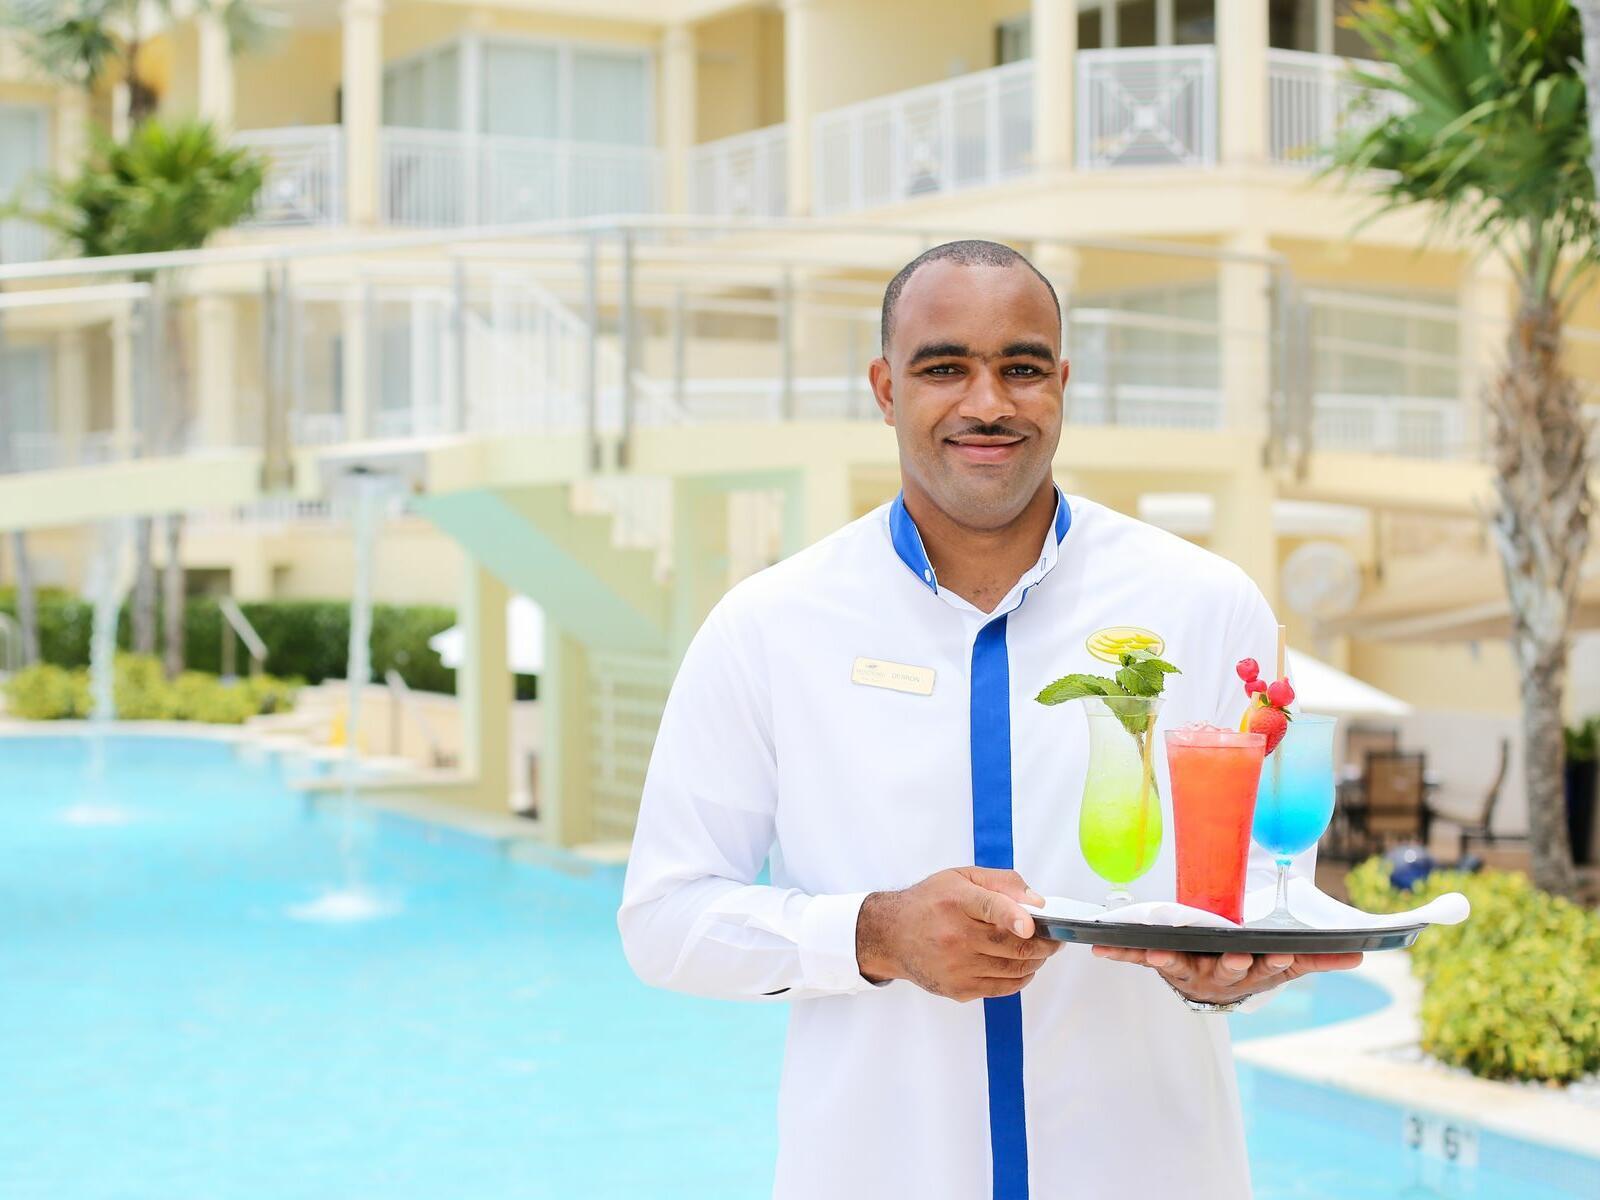 A Butler delivering drinks at Windsong Resort On The Reef